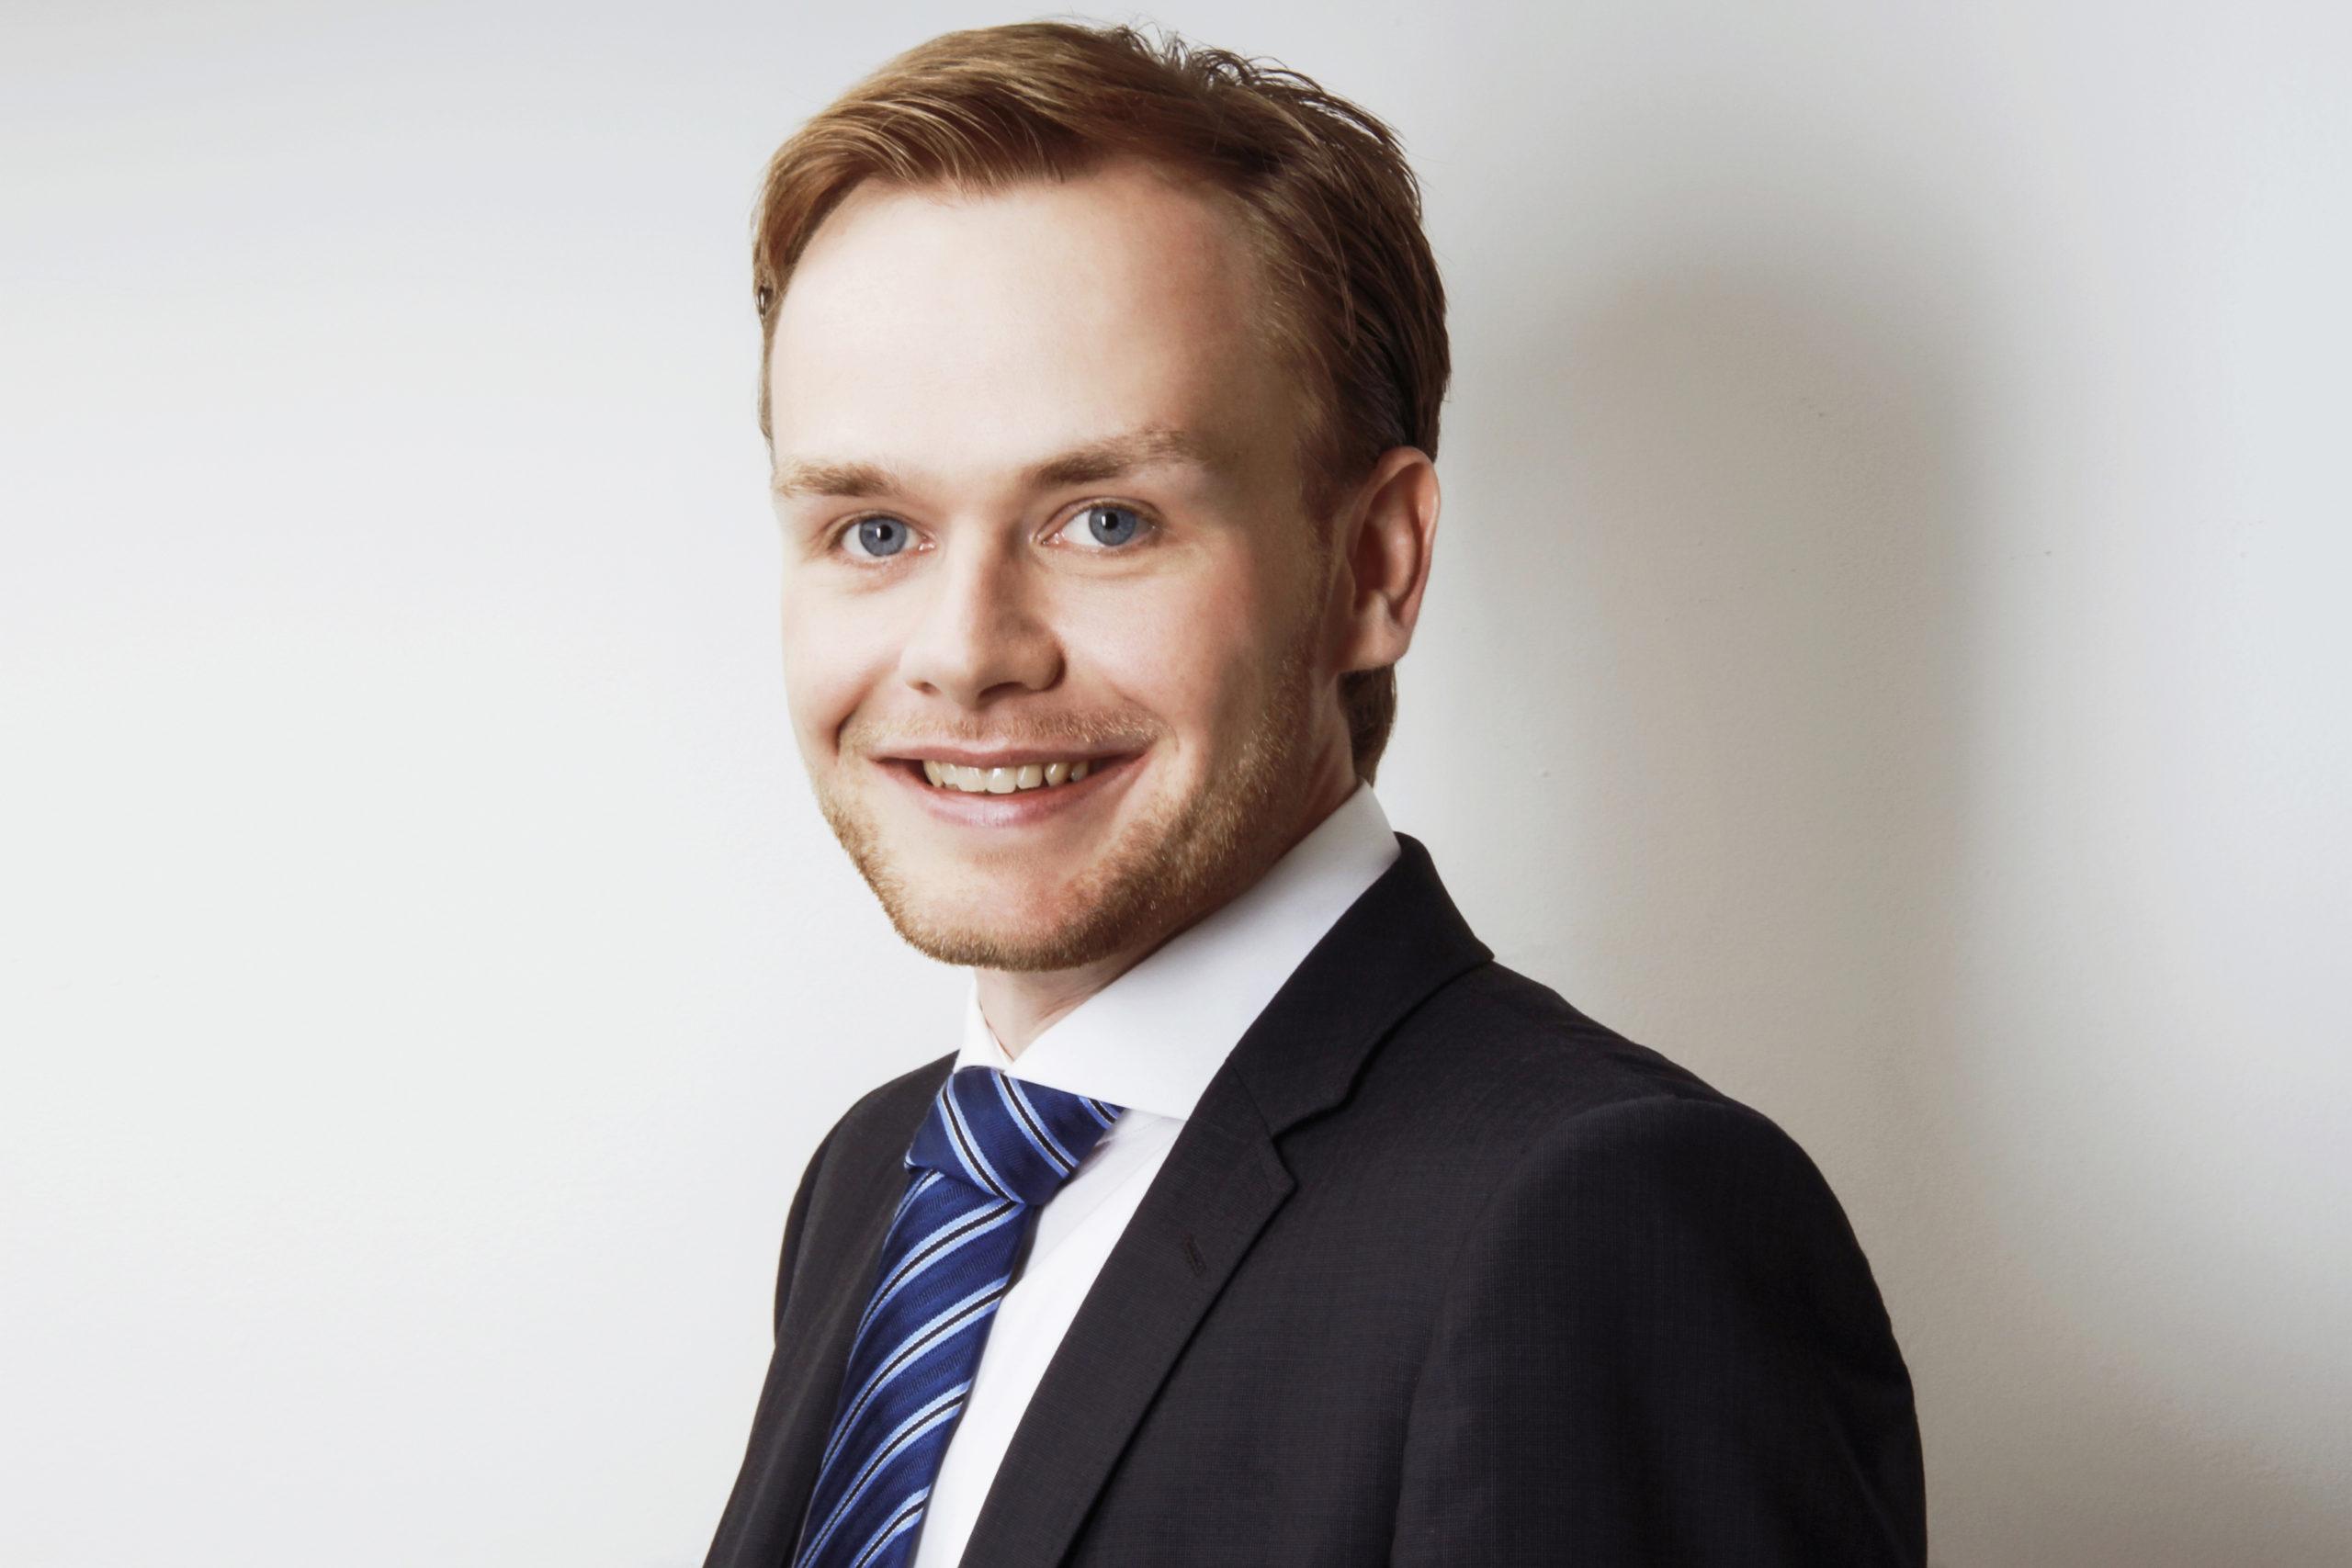 Karsten Hurrelmann, Dialogreihe Grüne Gründungen